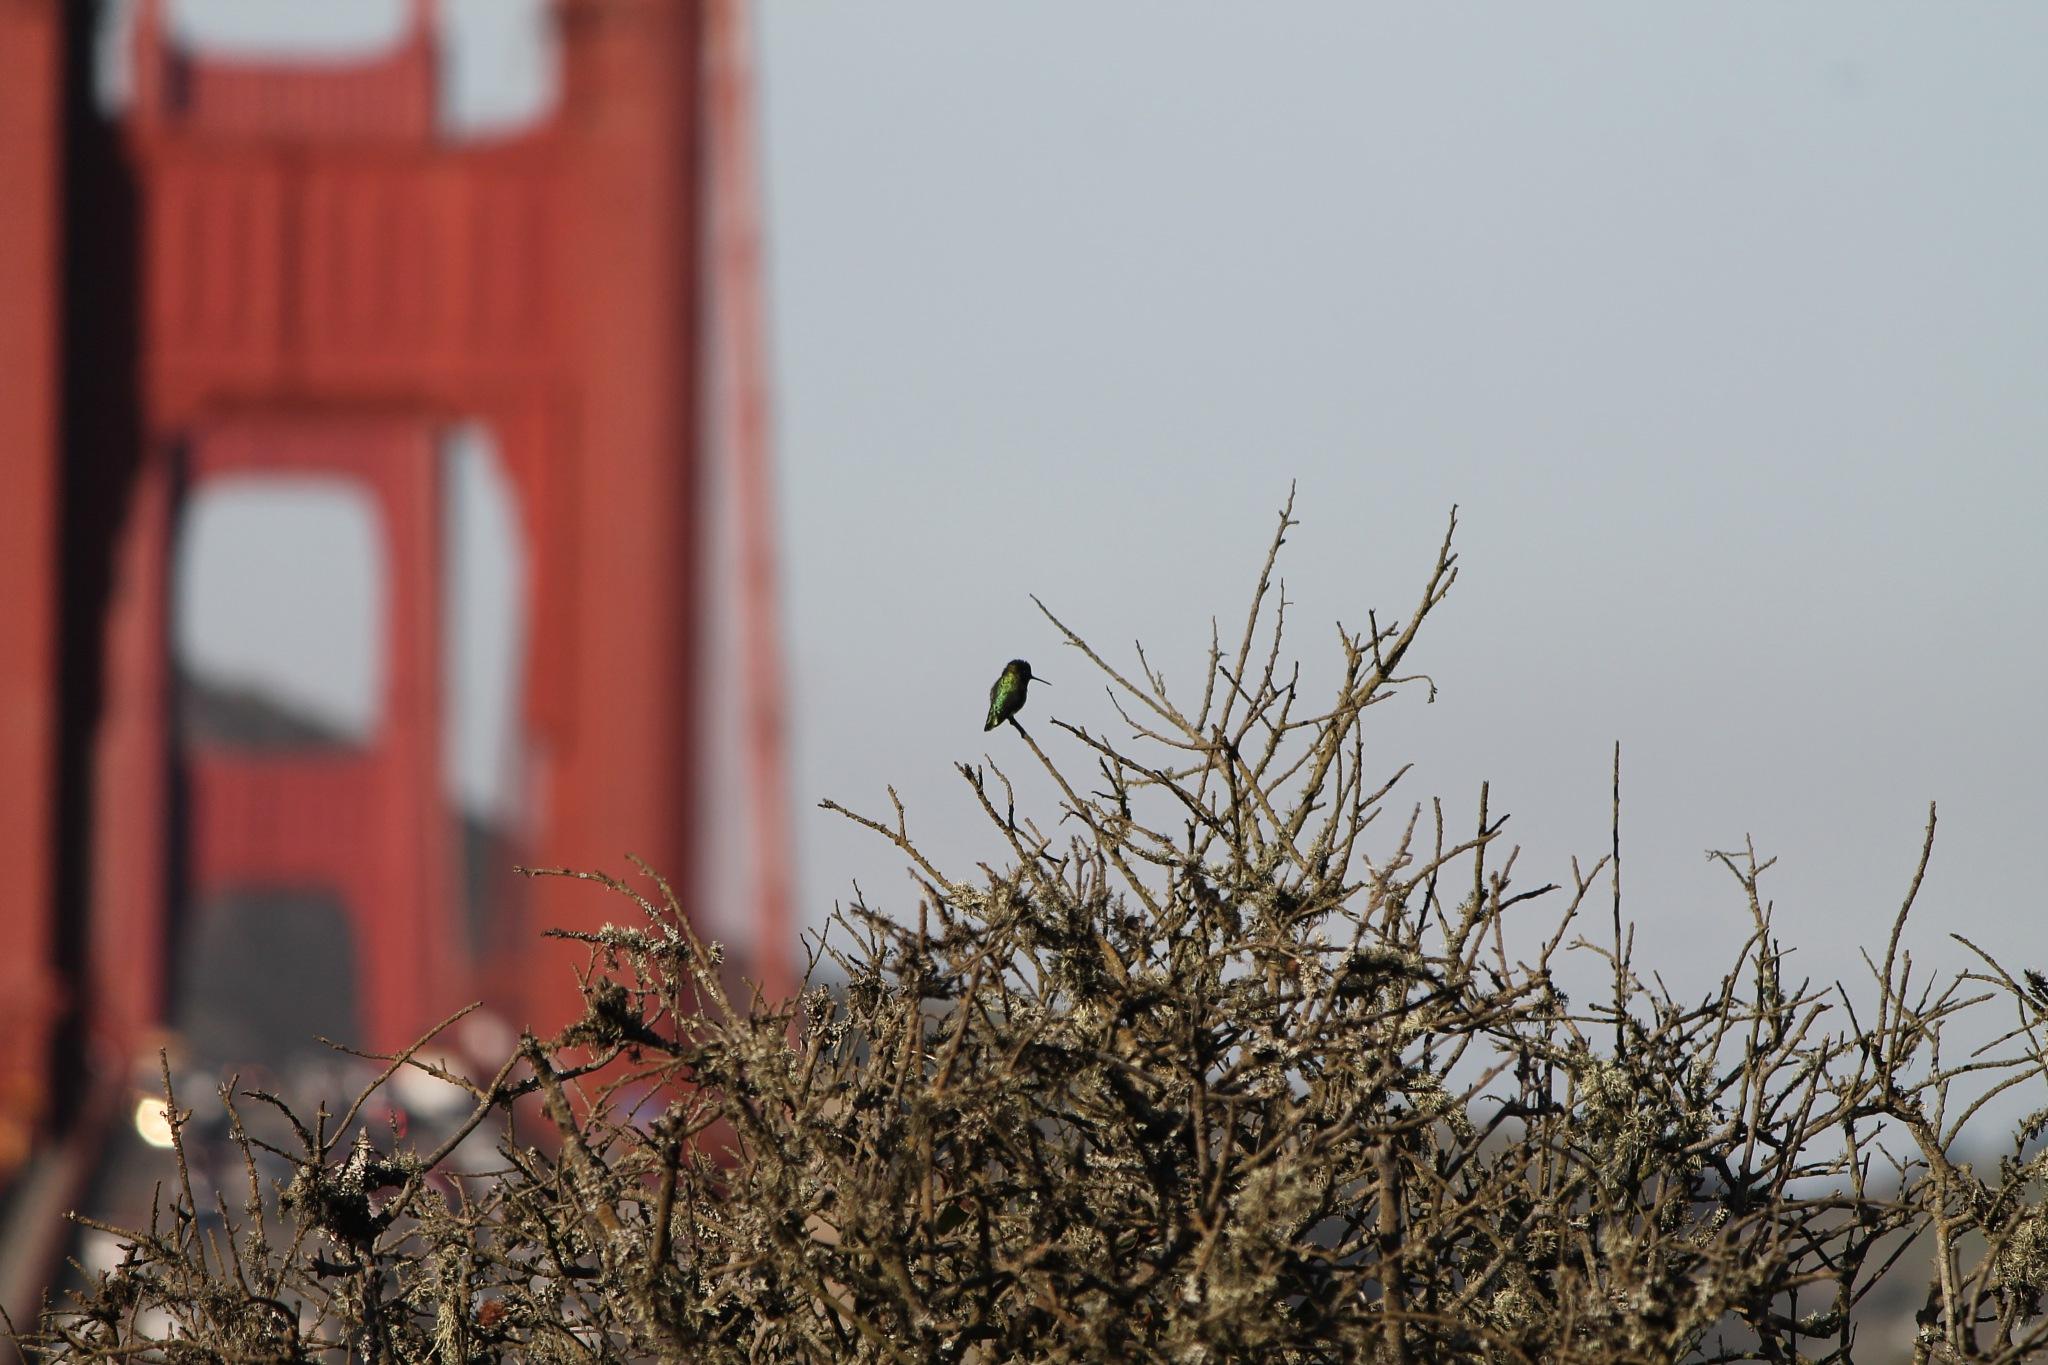 Waiting to cross the bridge by Pablo Senra